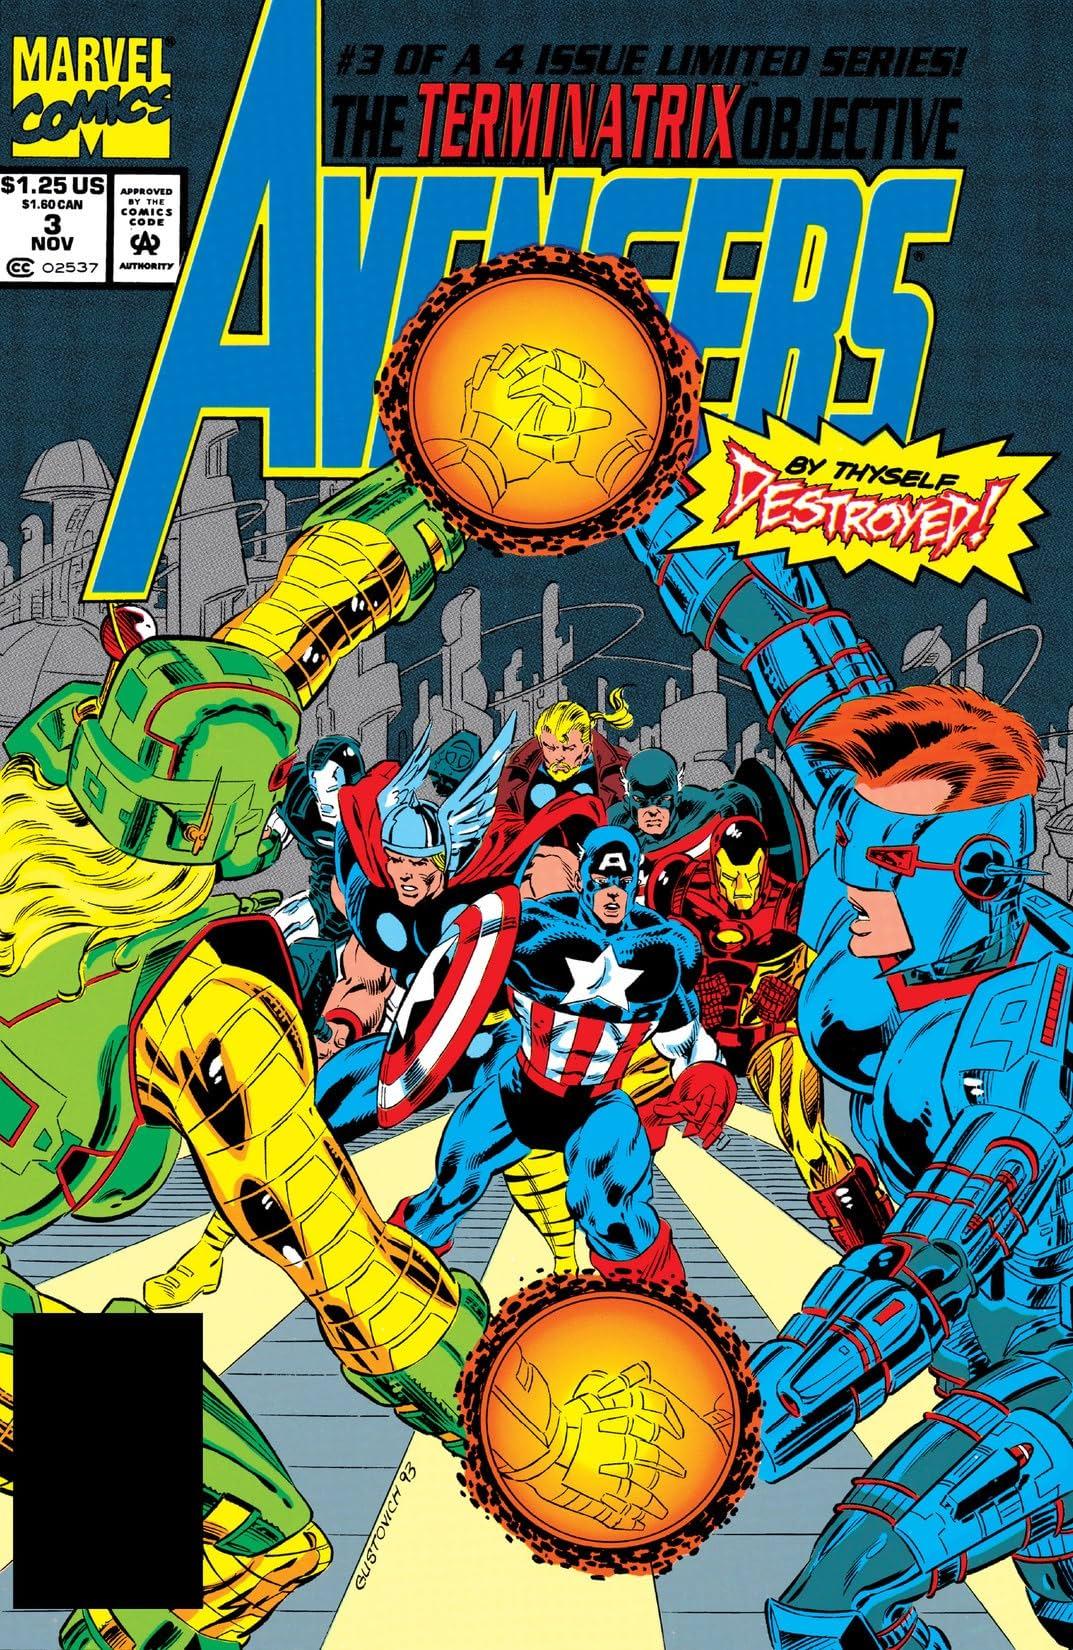 Avengers: The Terminatrix Objective (1993) #3 (of 4)